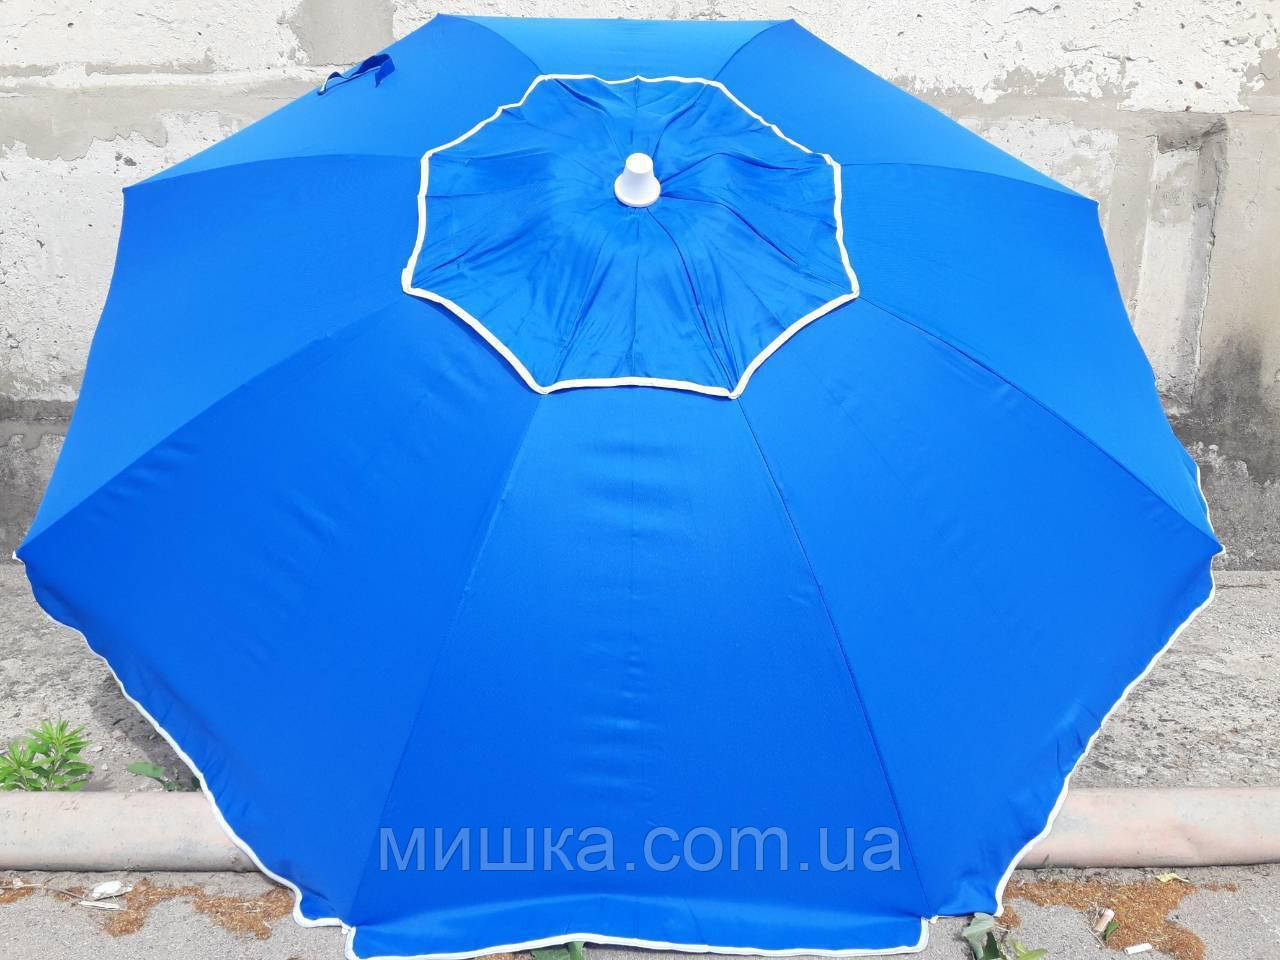 Пляжный зонт 1,8 м клапан наклон чехол